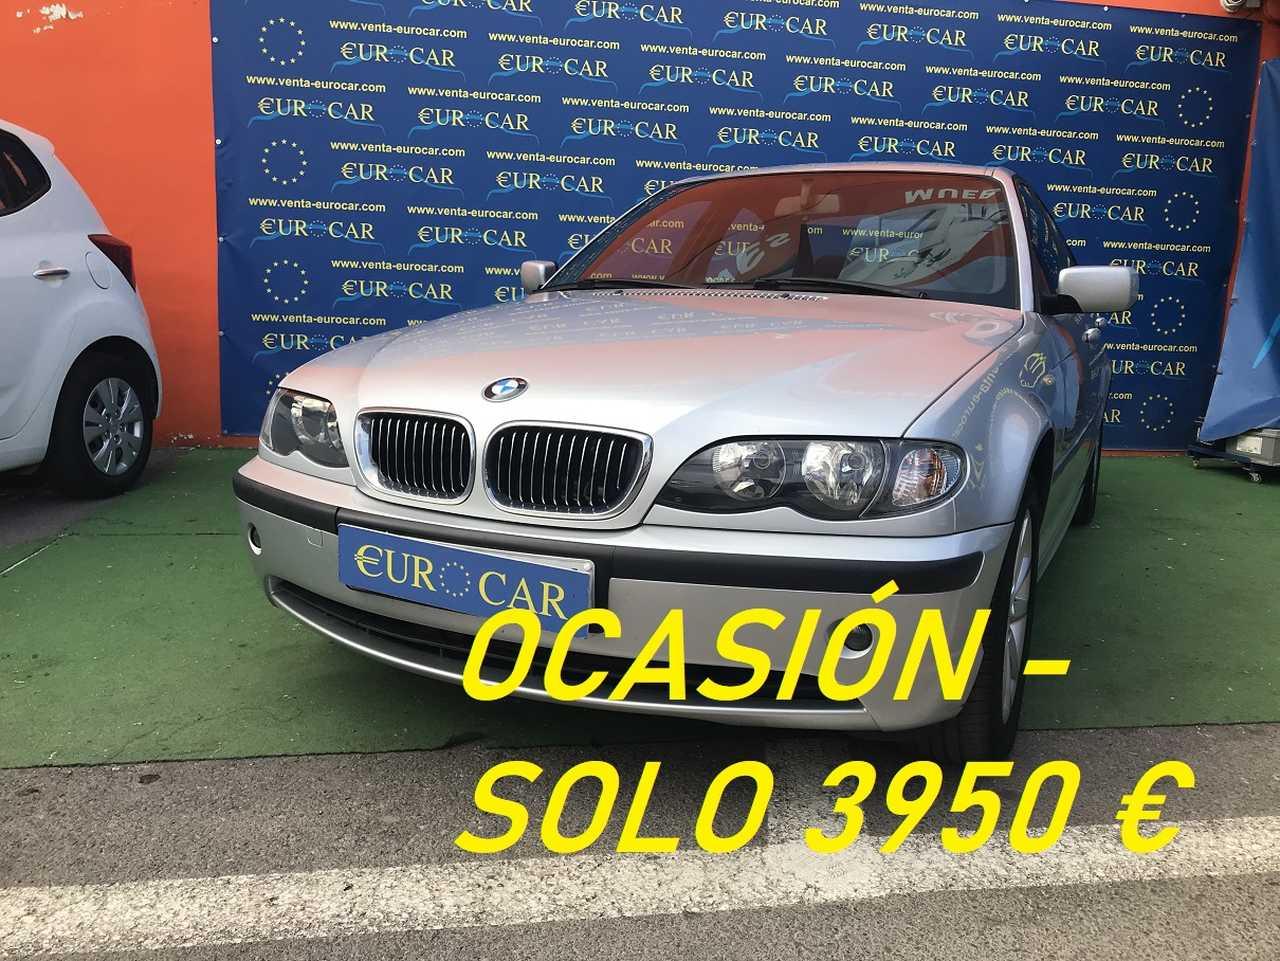 BMW Serie 3 ocasión segunda mano 2003 Diésel por 2.950€ en Alicante